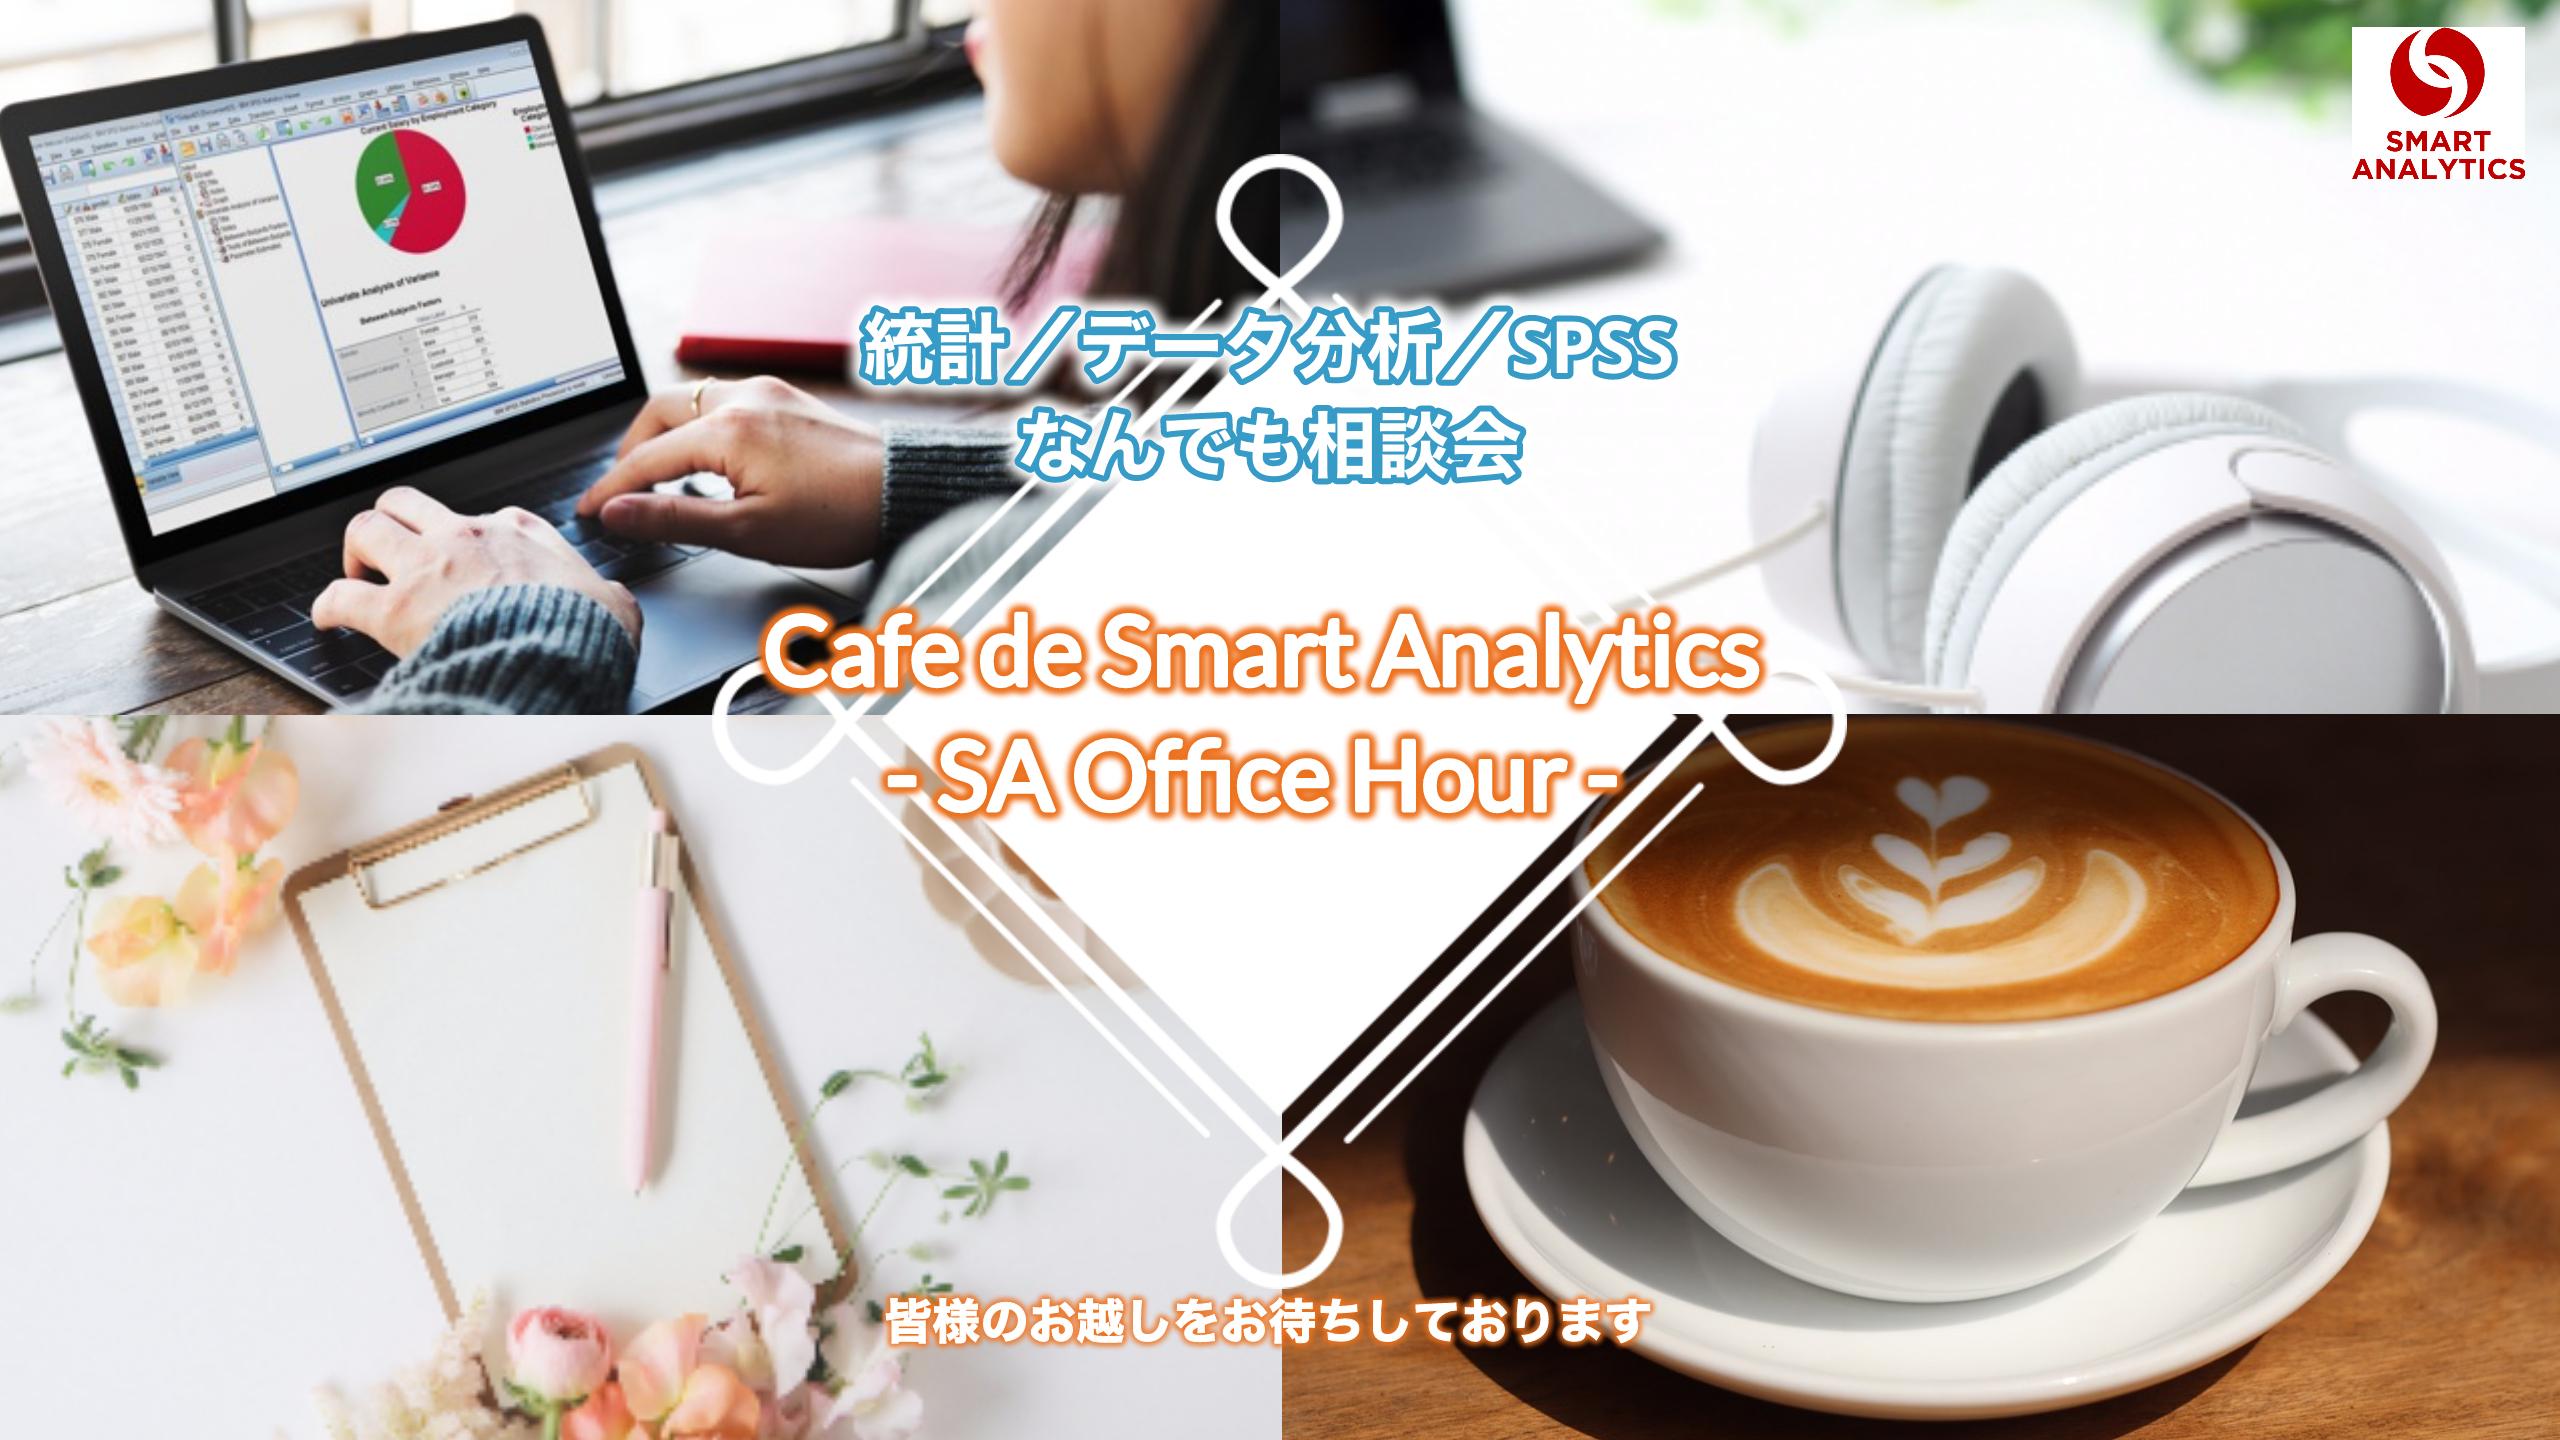 Cafe de Smart Analytics